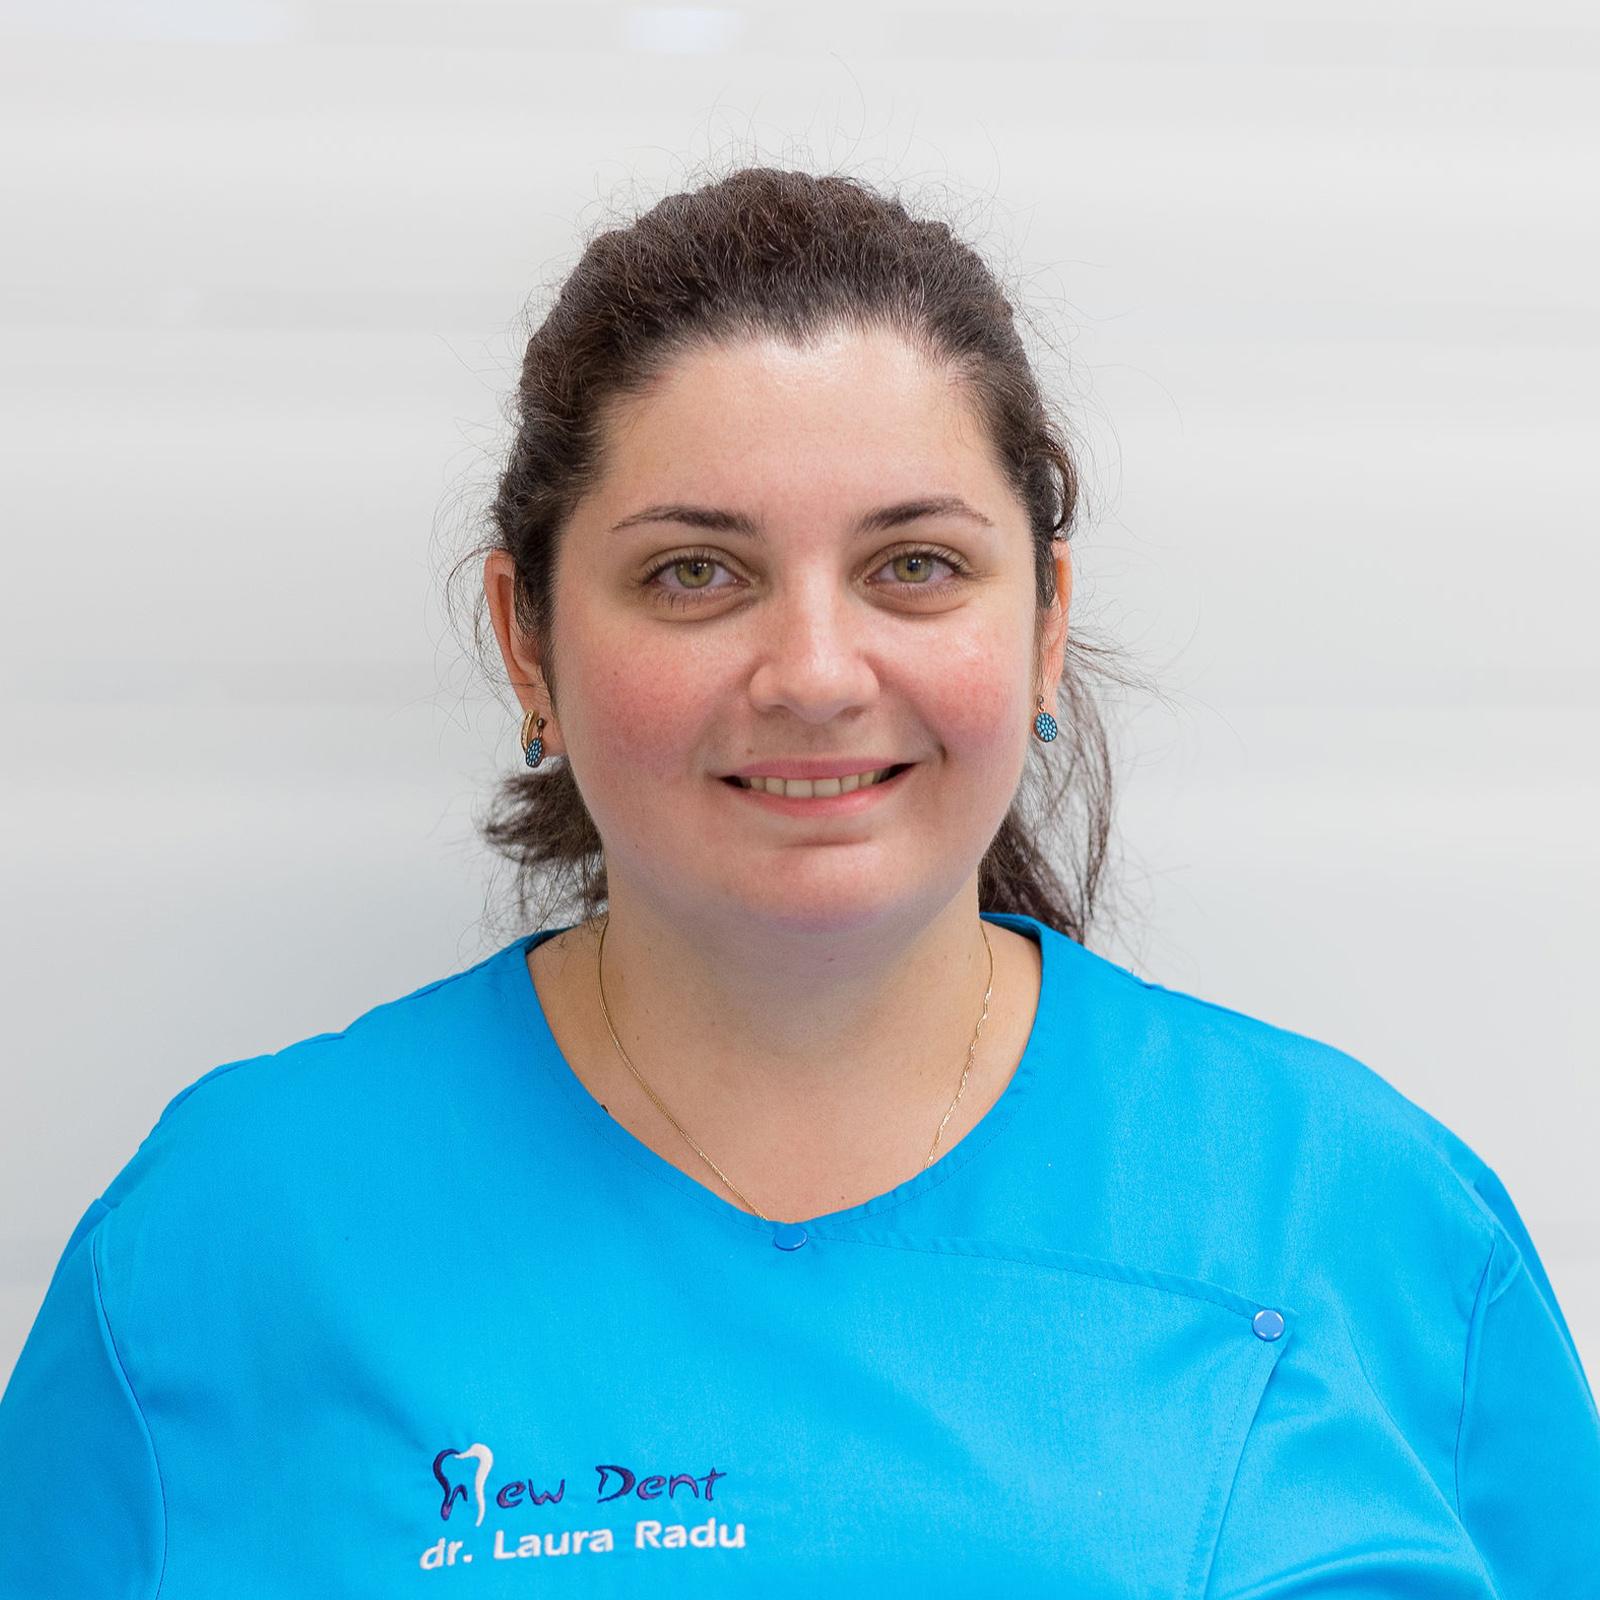 dr. Laura Radu